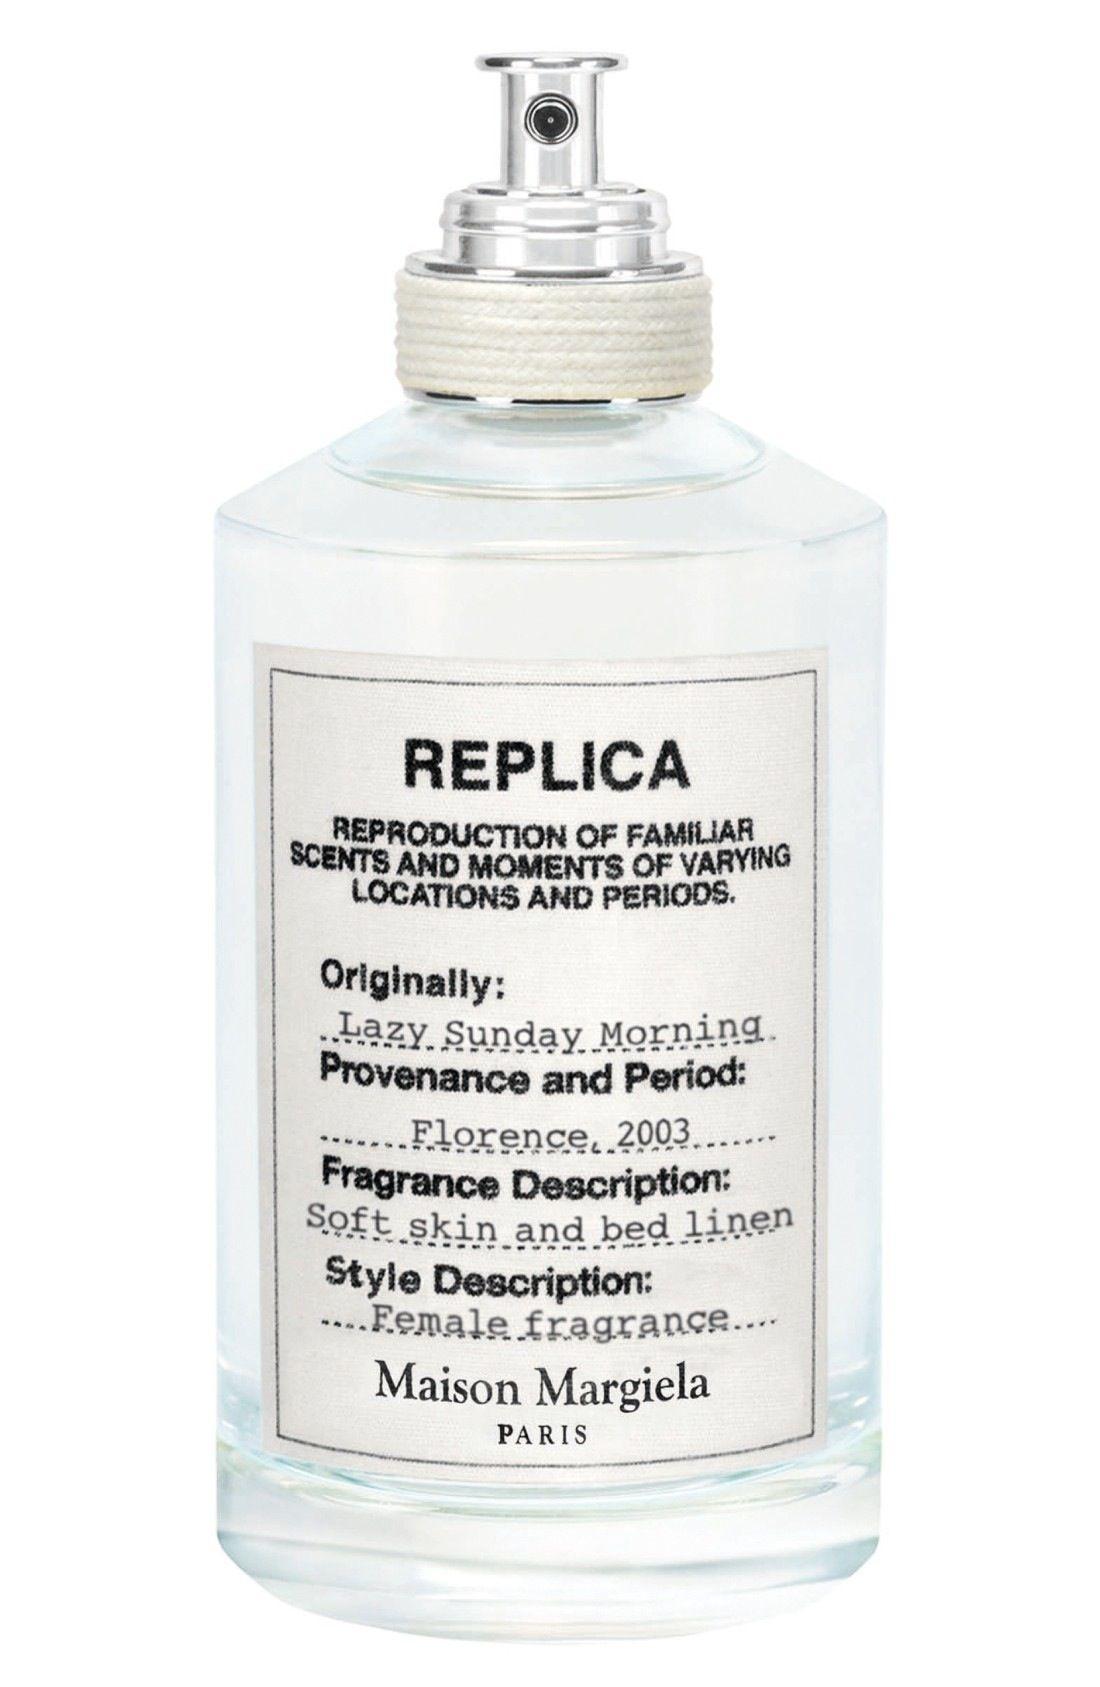 Replica Parfum Lazy Sunday Morning, natürliche produkte